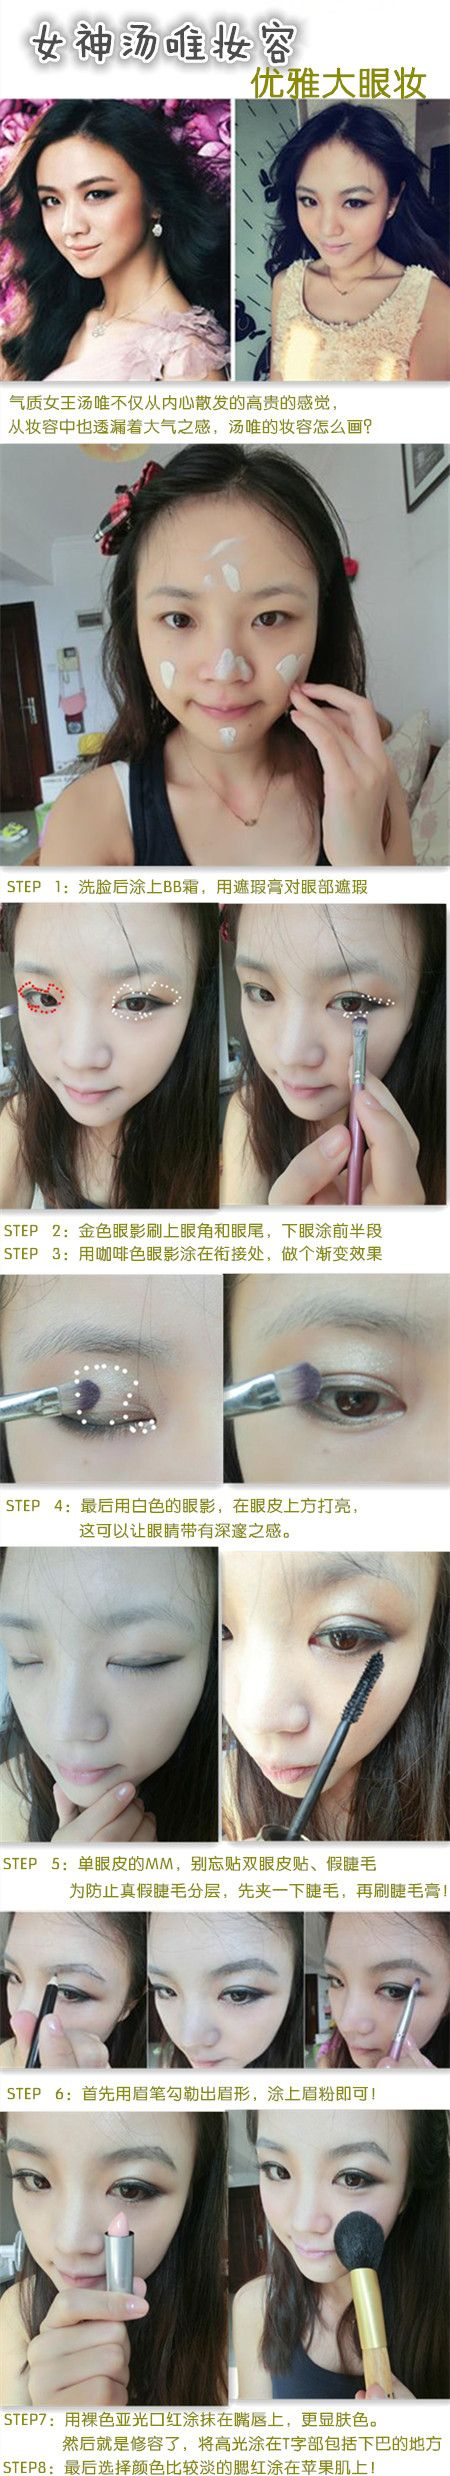 chinese makeup tutorial #ClassyLadyEntrepreneur ⭐️ wwwAsianSkincare.Rocks